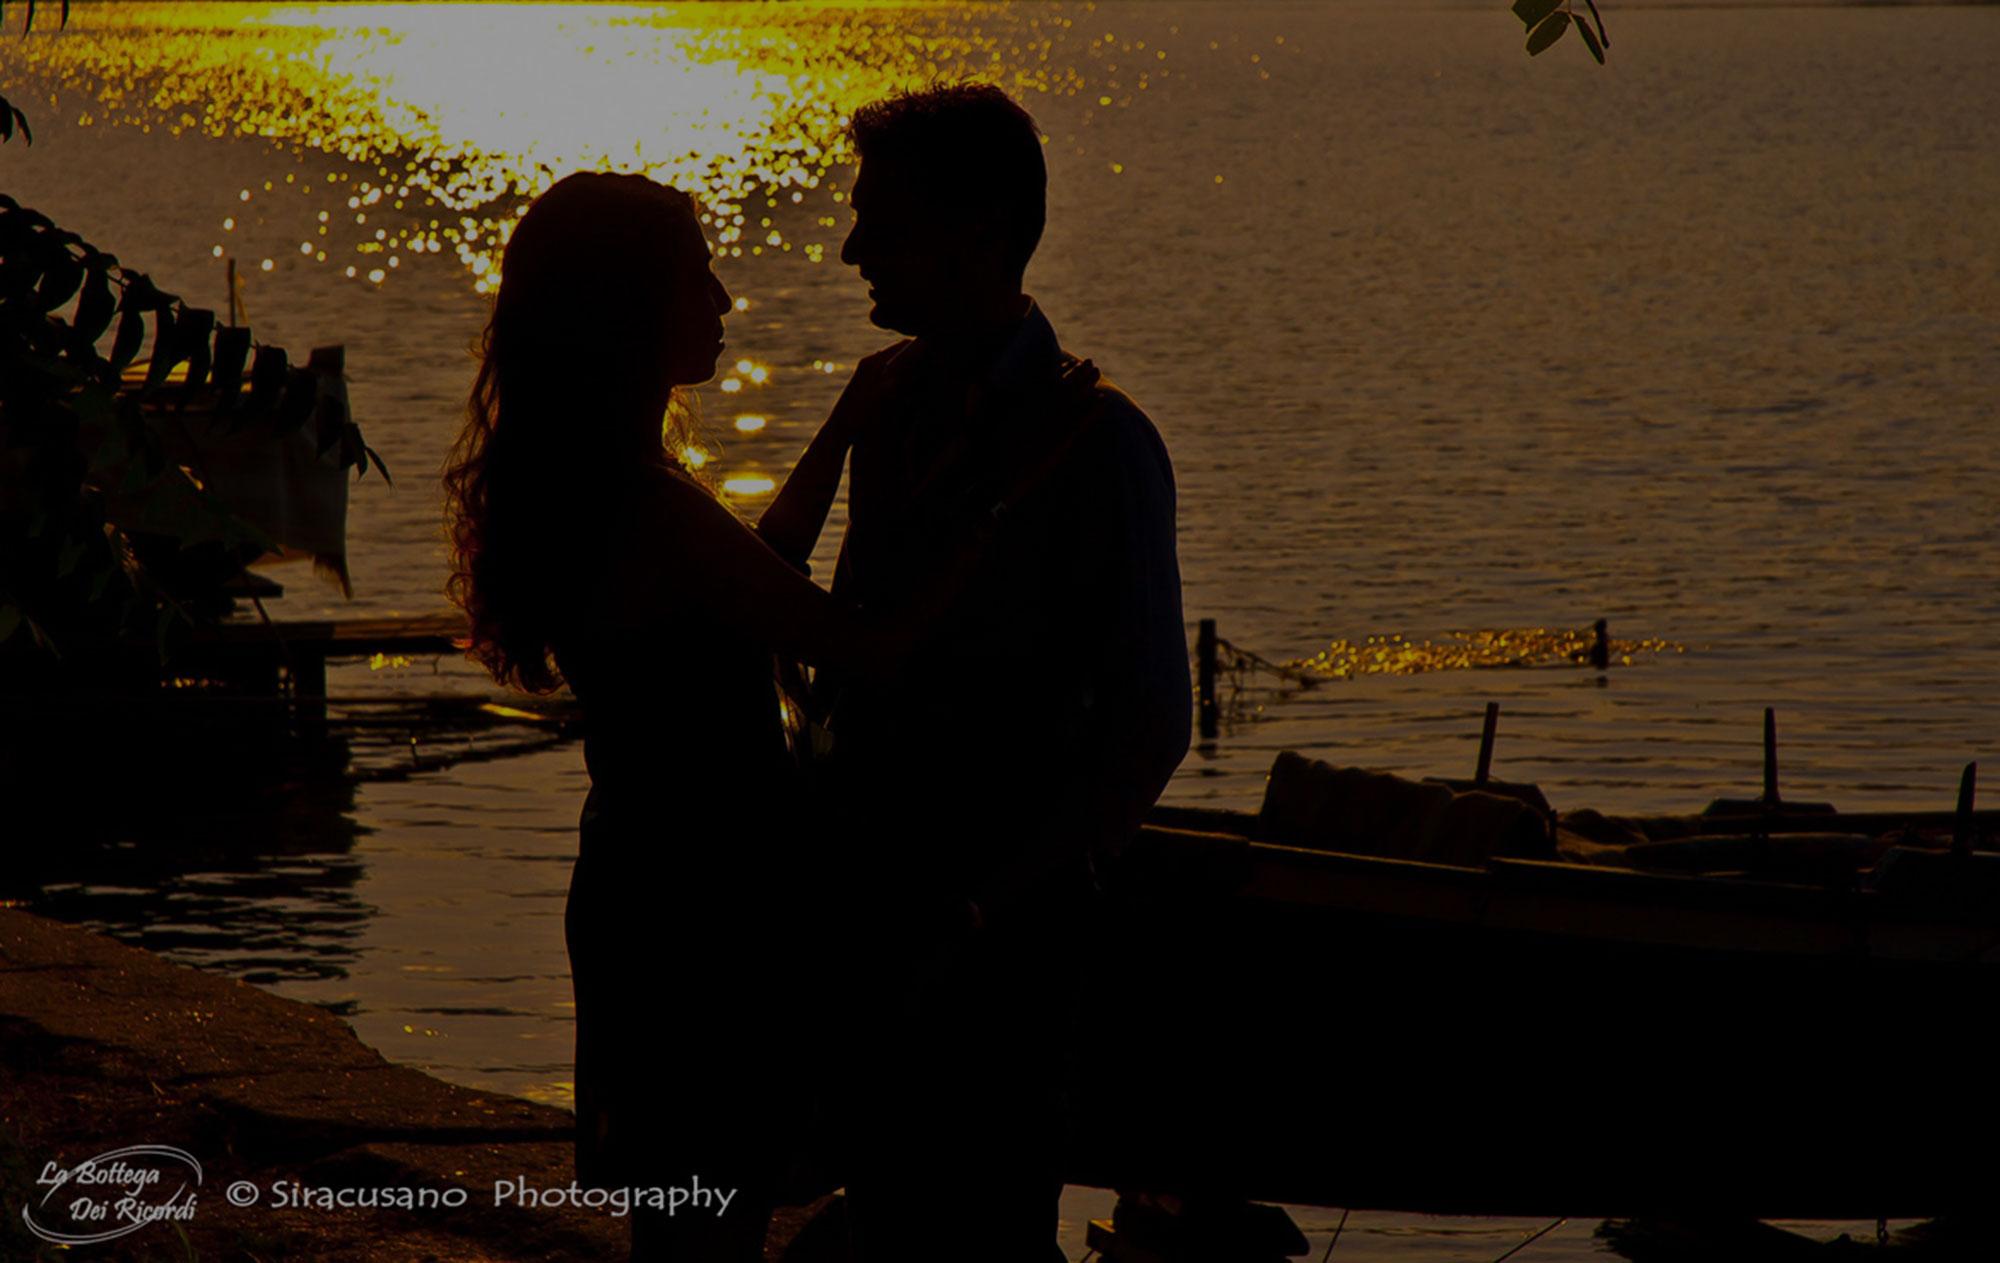 Fotografo Matrimonio La Bottega dei Ricordi Messina - Matrimonio Giulio e Barbara